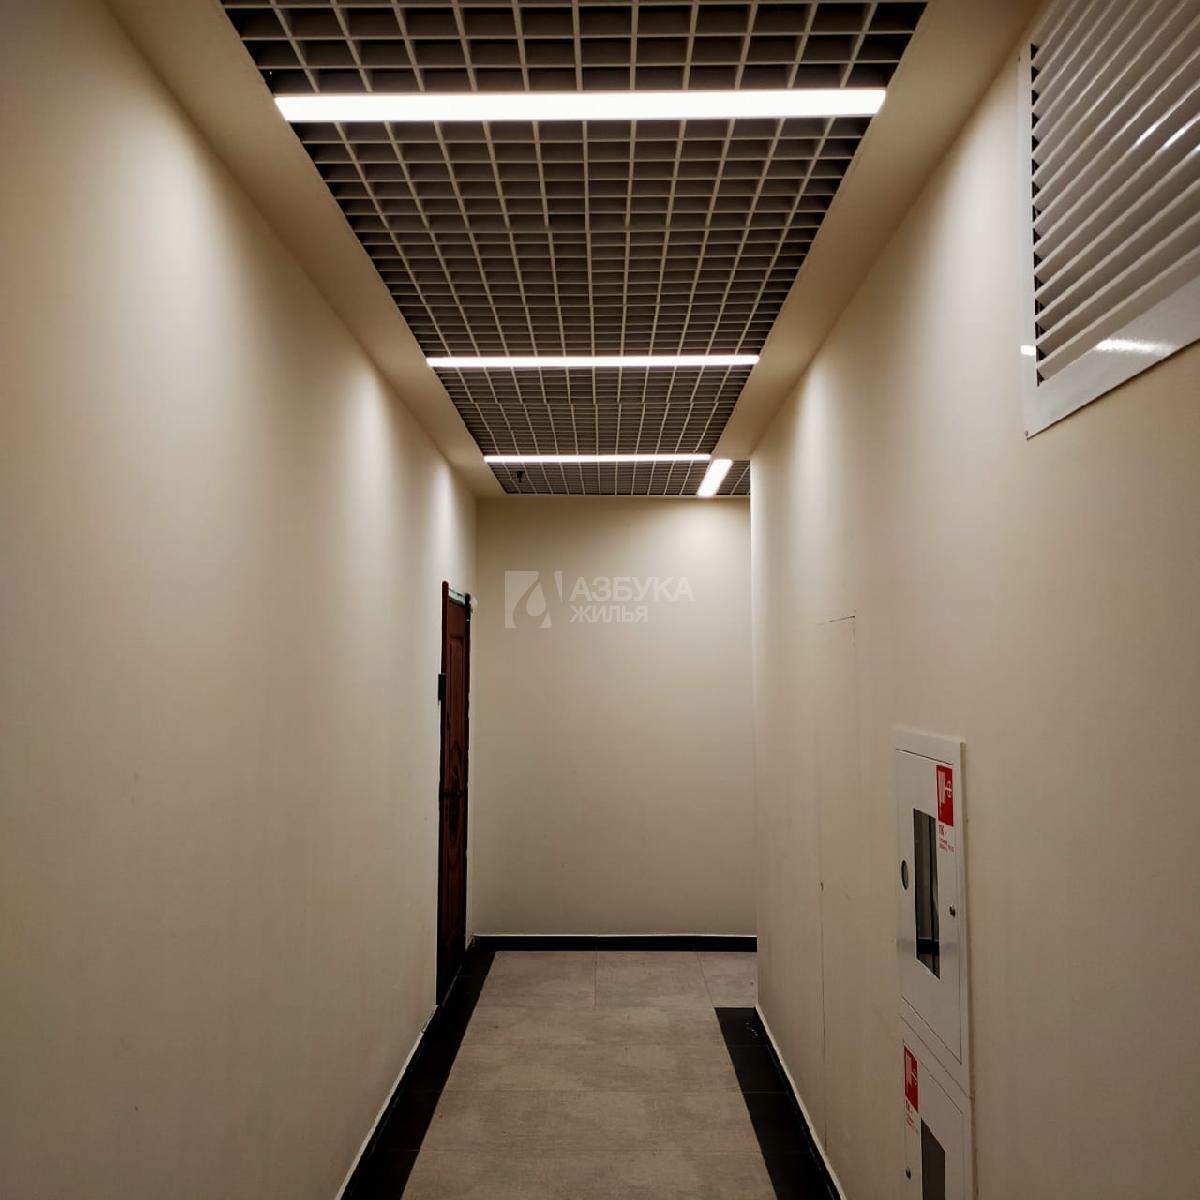 Фото №25 - 3-комнатная квартира, Москва, Серебрякова проезд 11 корпус 1, метро Ботанический сад